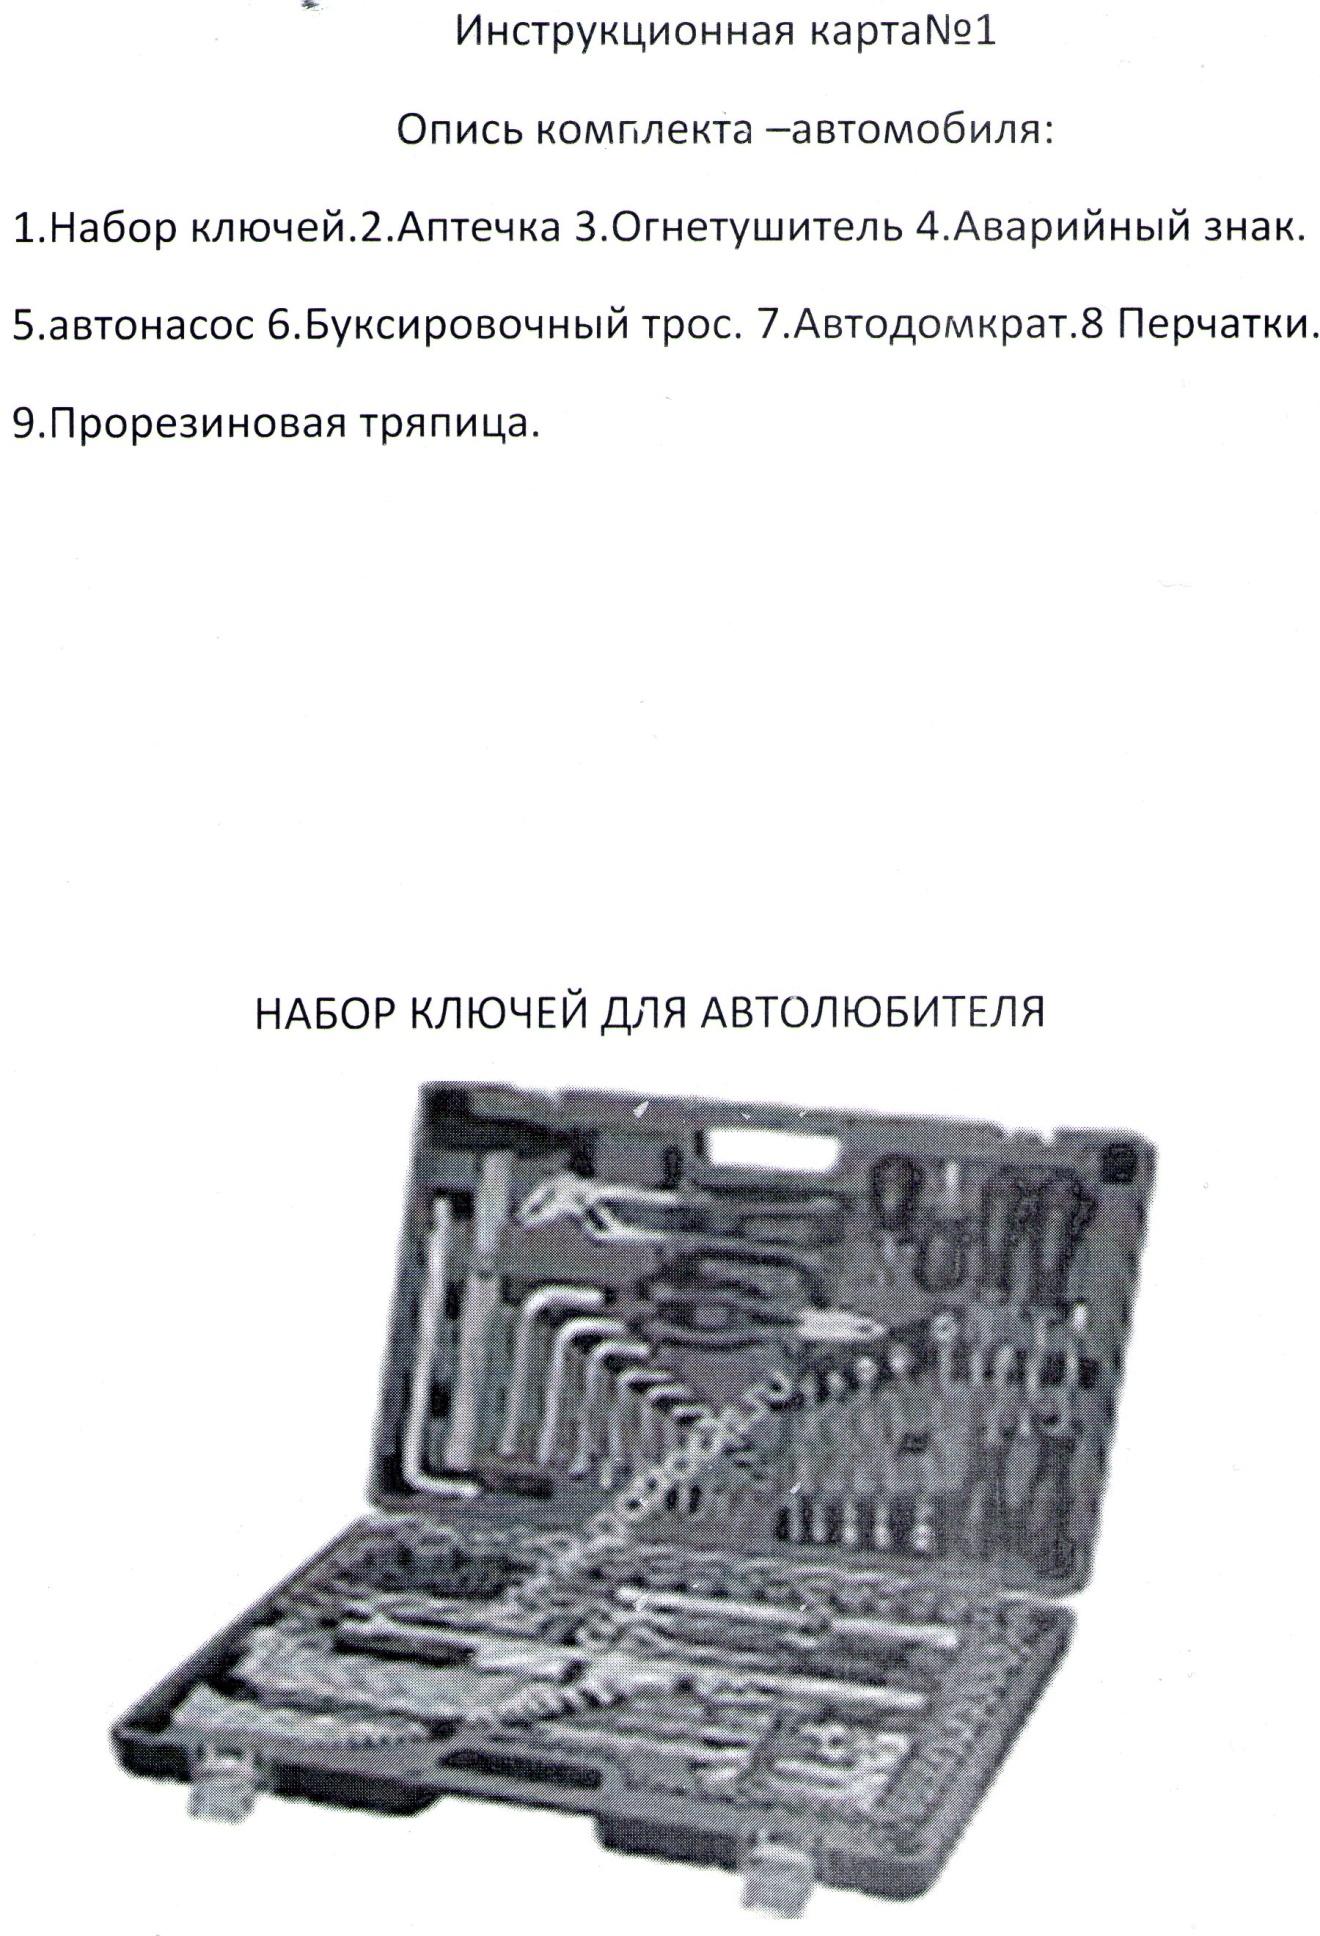 C:\Users\Василий Мельченко\Pictures\img635.jpg